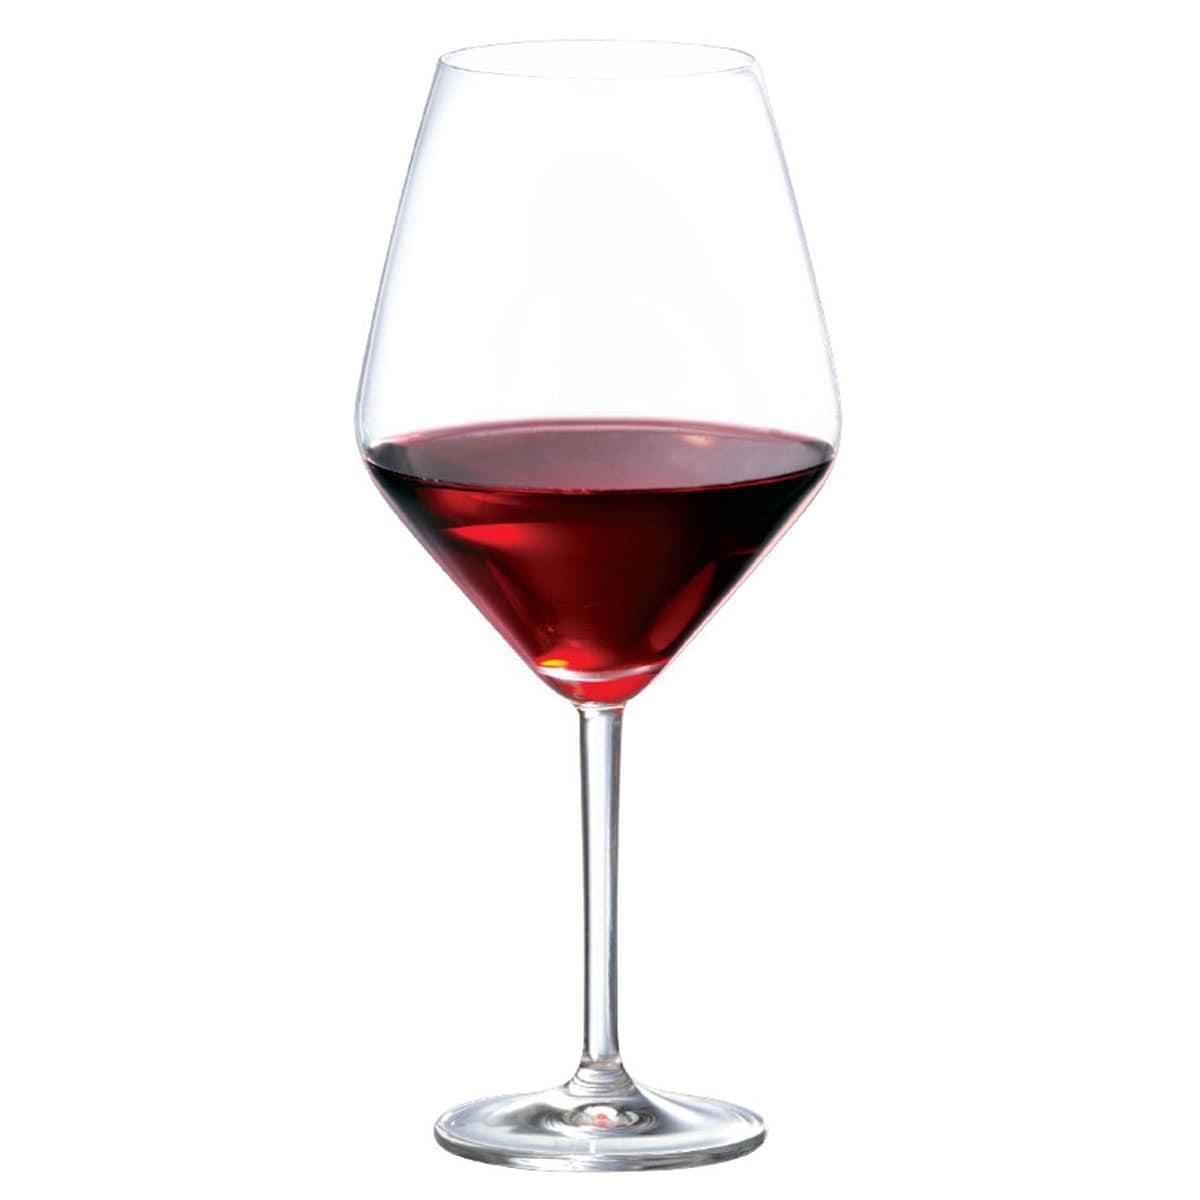 Taça de Vinho Tinto Cristal Elegance 775ml